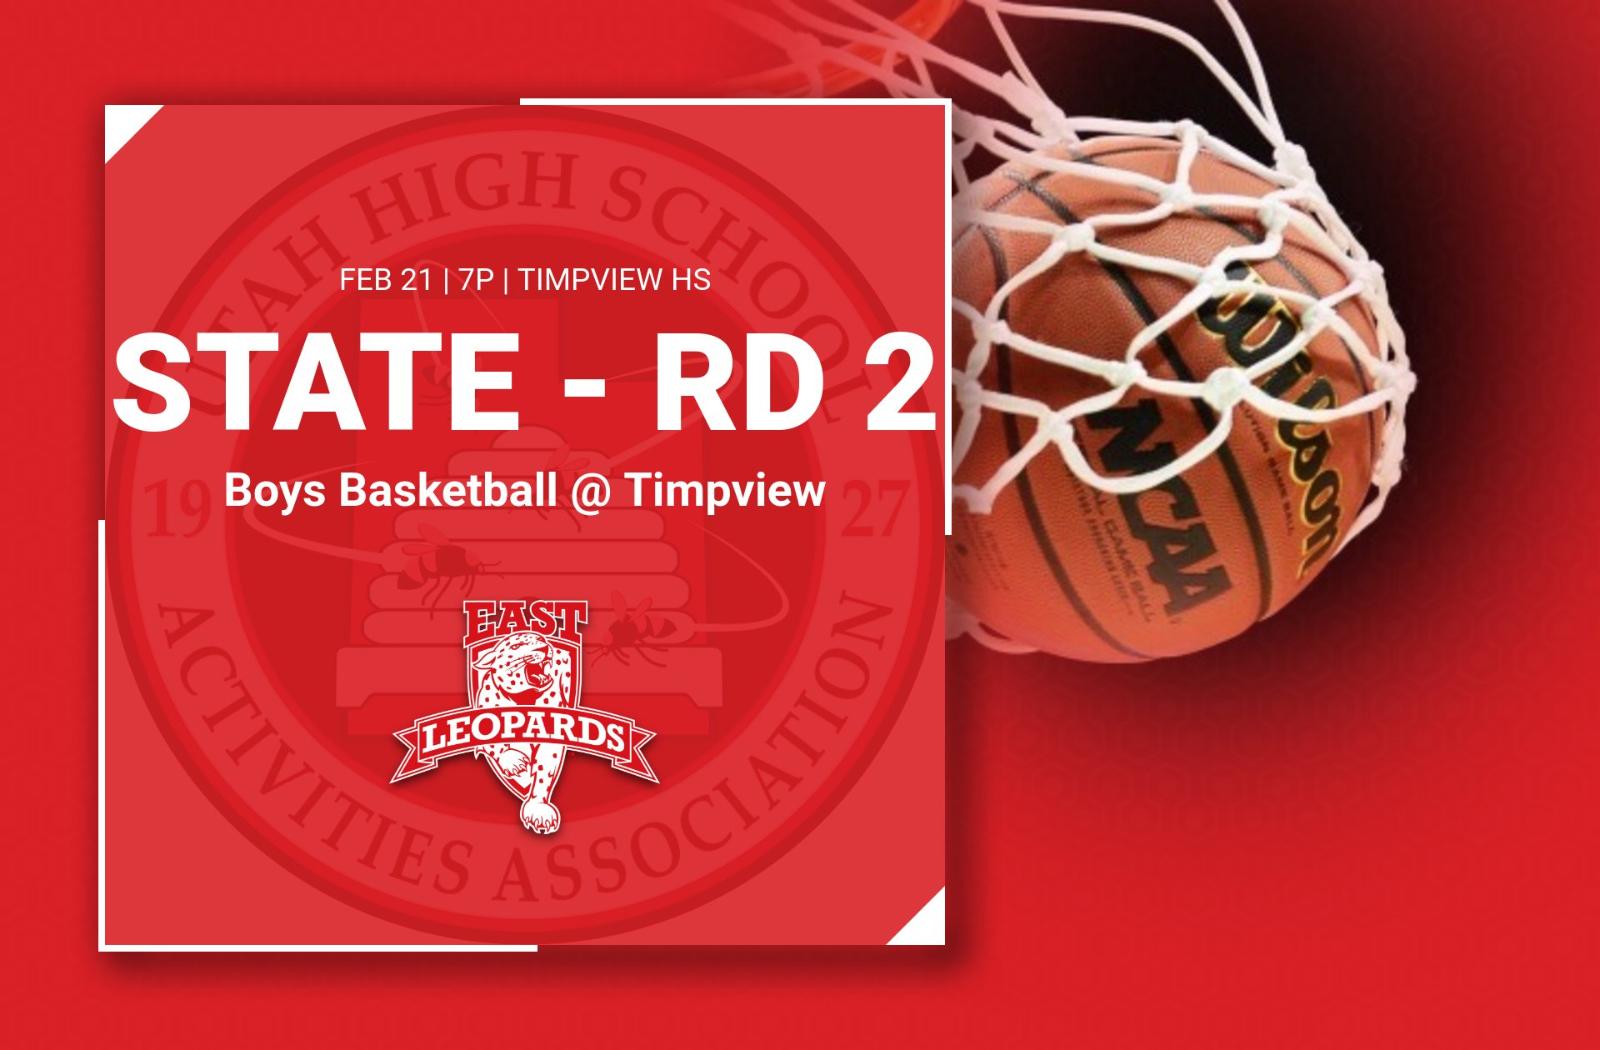 Gameday: Boys Basketball at Timpview